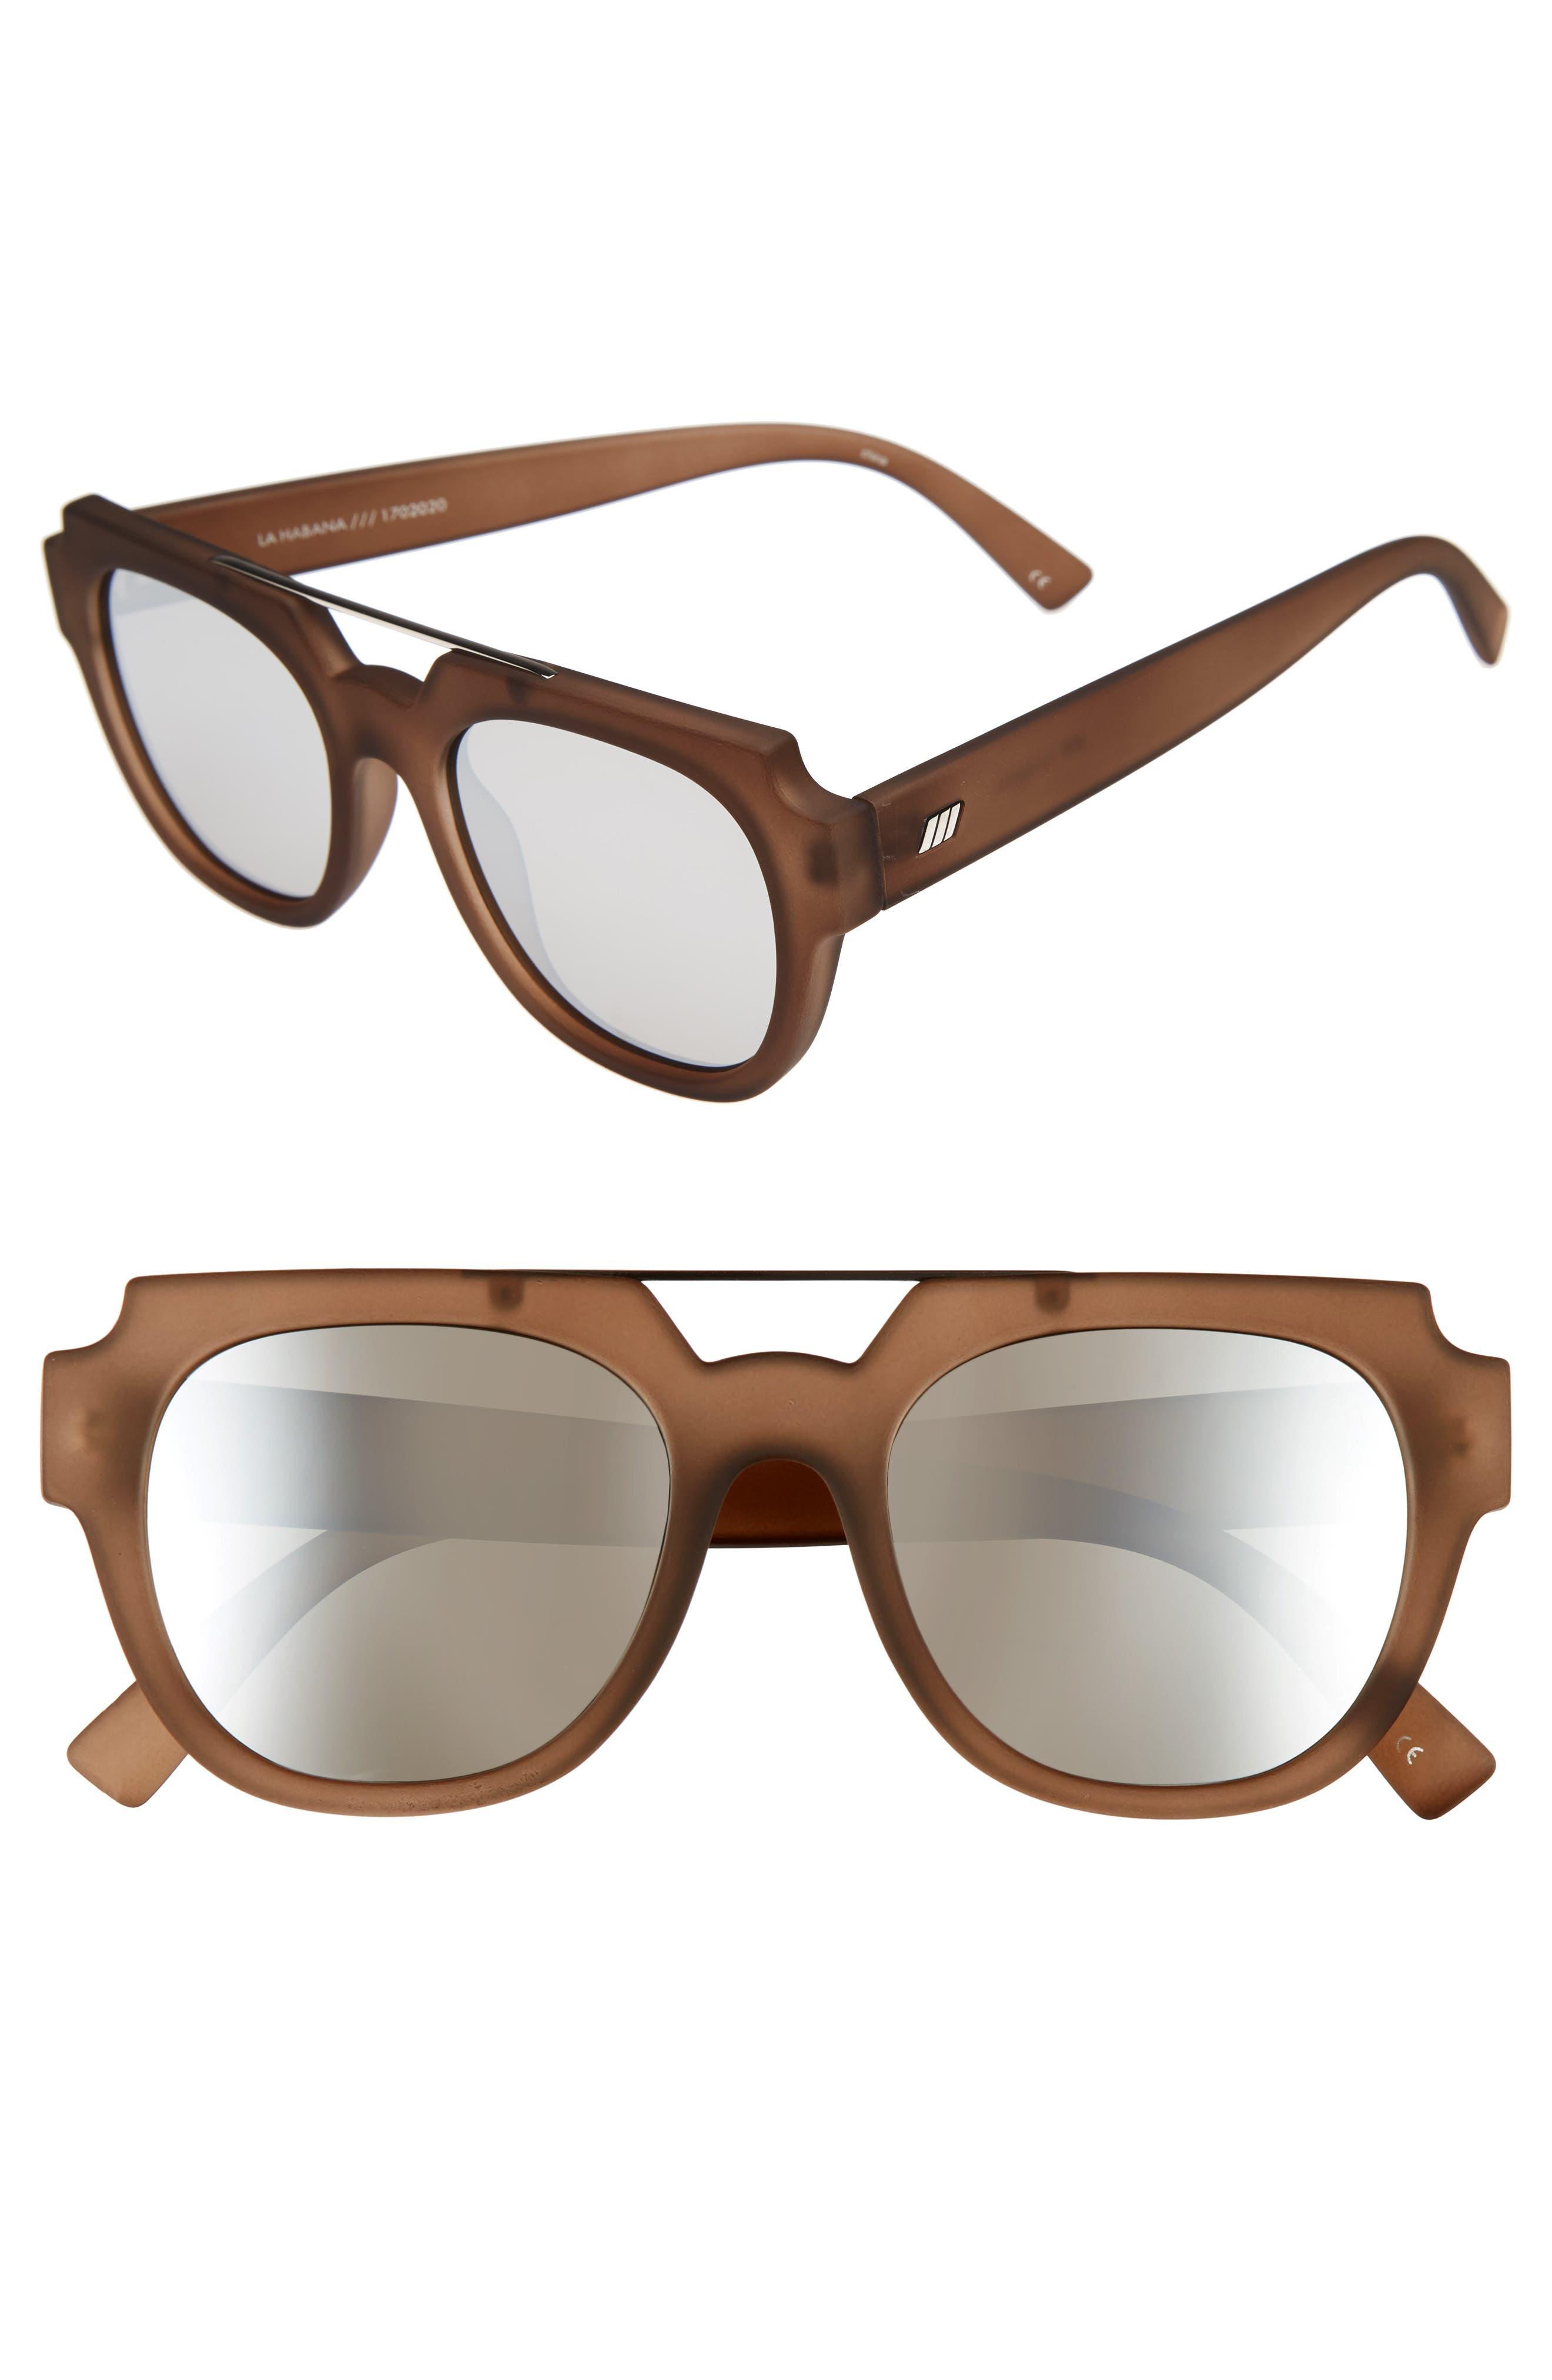 La Habana 52mm Retro Sunglasses,                             Main thumbnail 3, color,